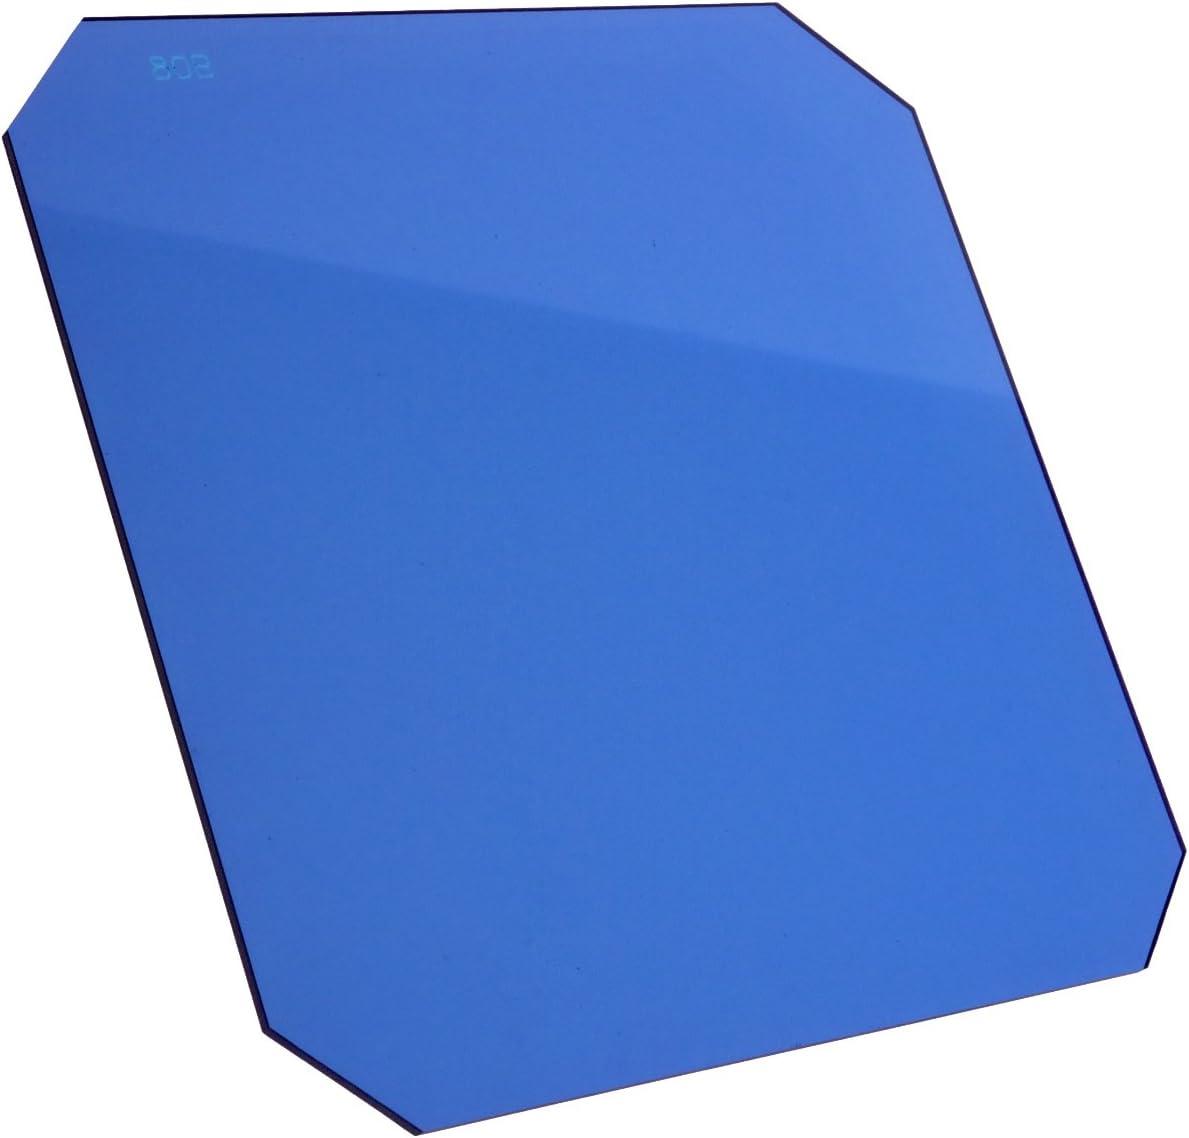 4x4 Formatt-Hitech 100x100mm Resin Solid Color Red 1